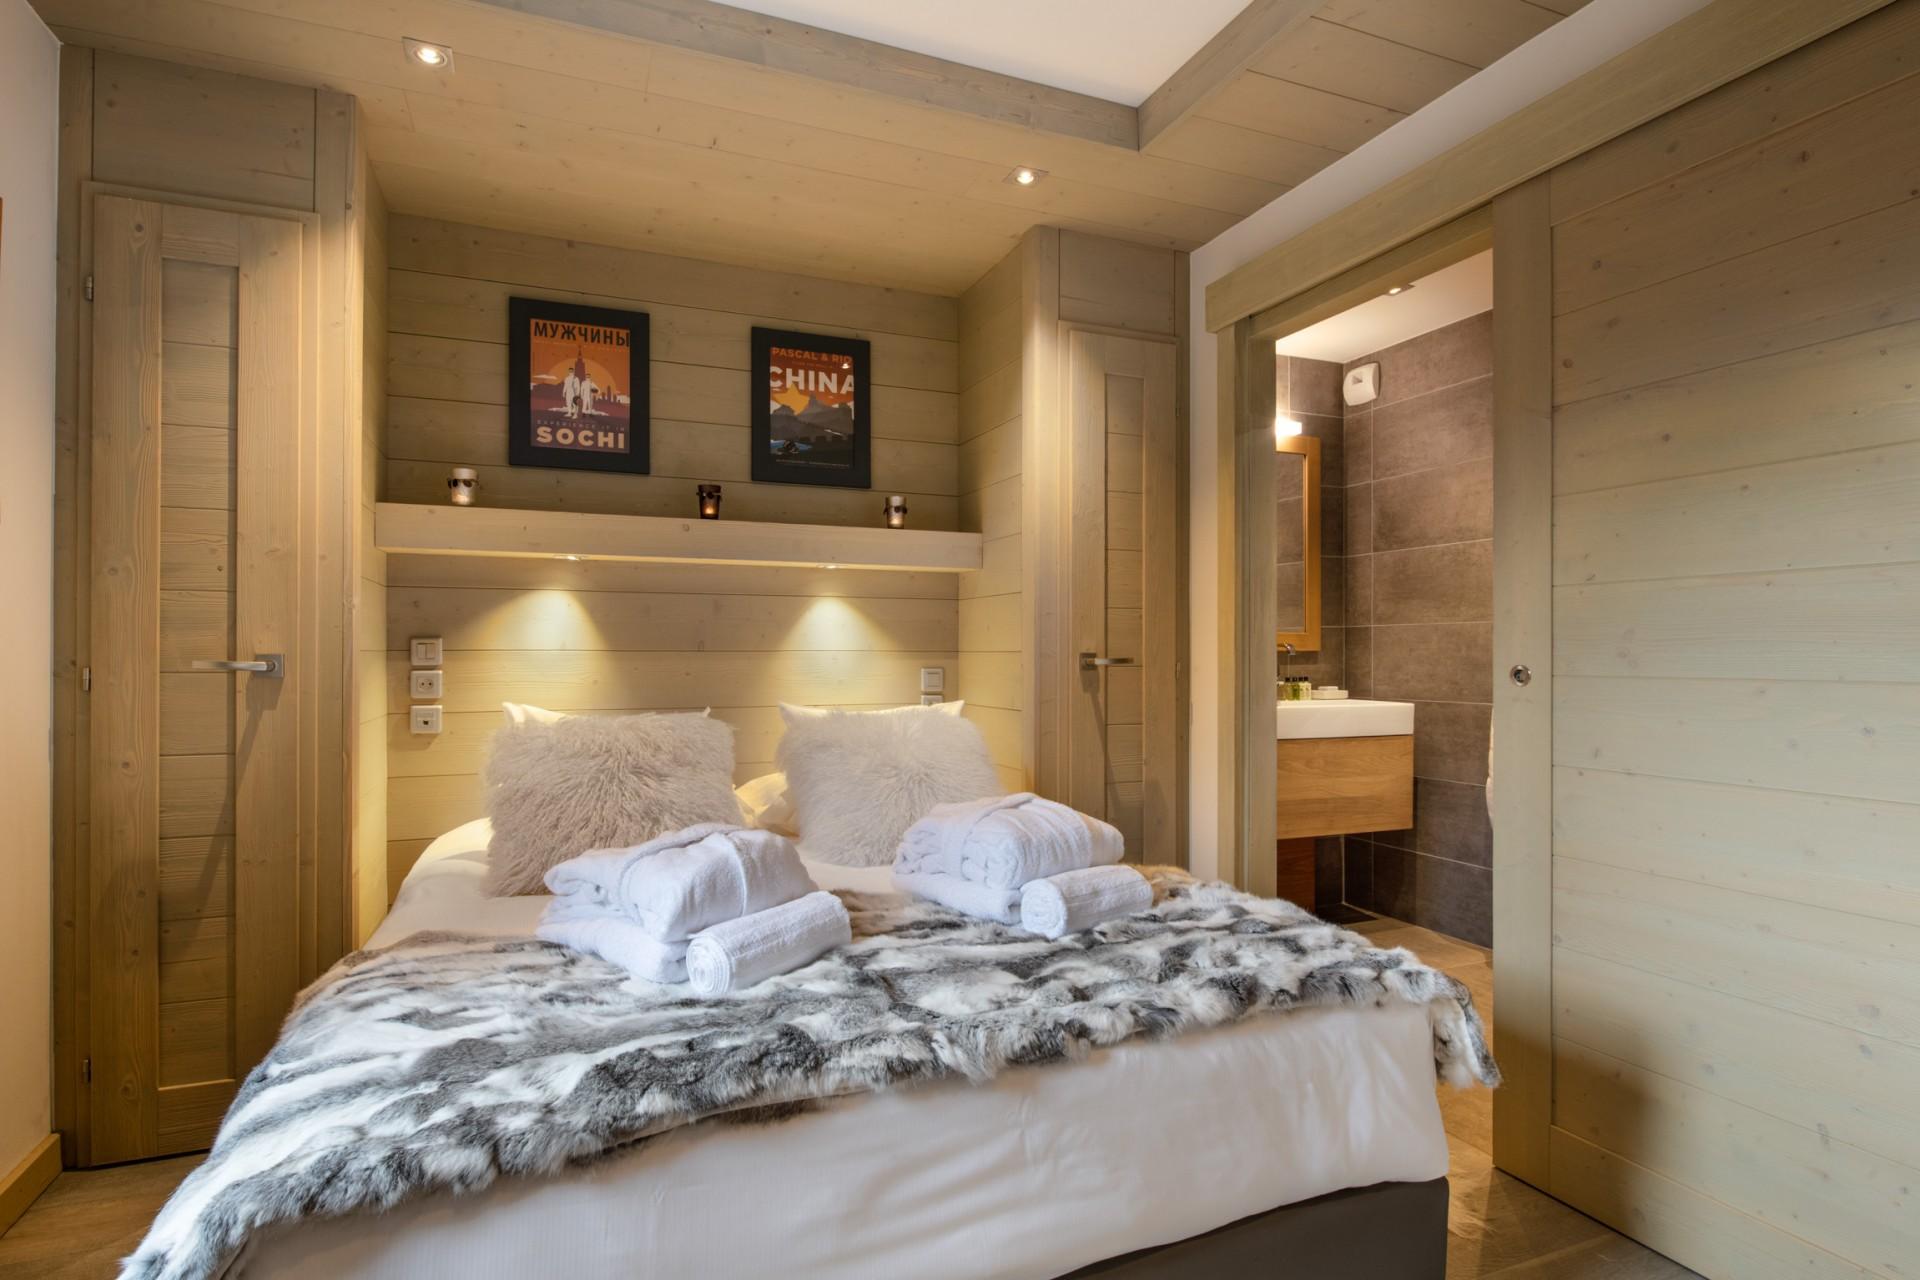 Courchevel 1650 Location Appartement Luxe Alsolite Chambre 2